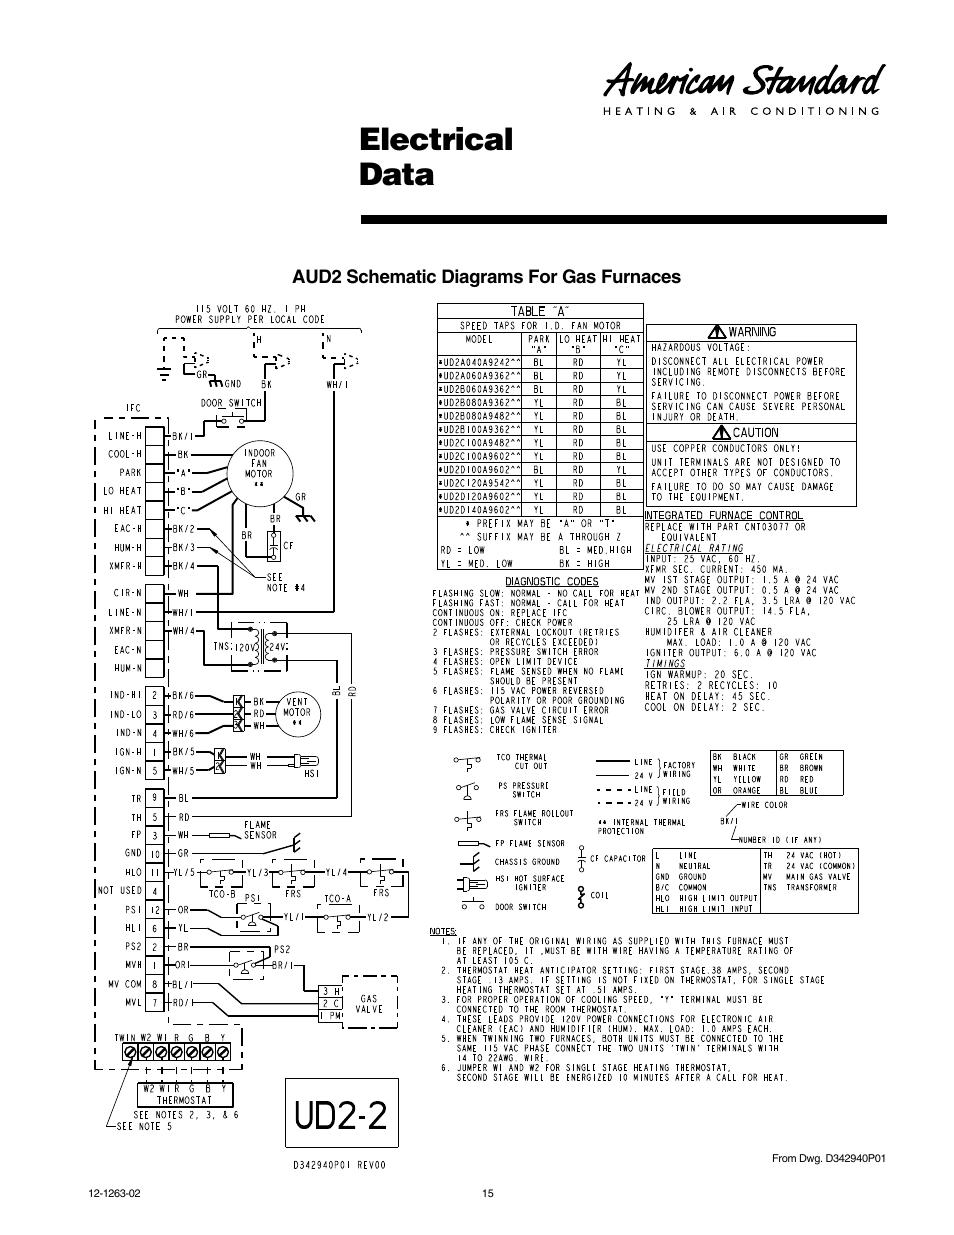 medium resolution of electrical data american standard freedom 80 user manual page 15 rh manualsdir com american standard furnace